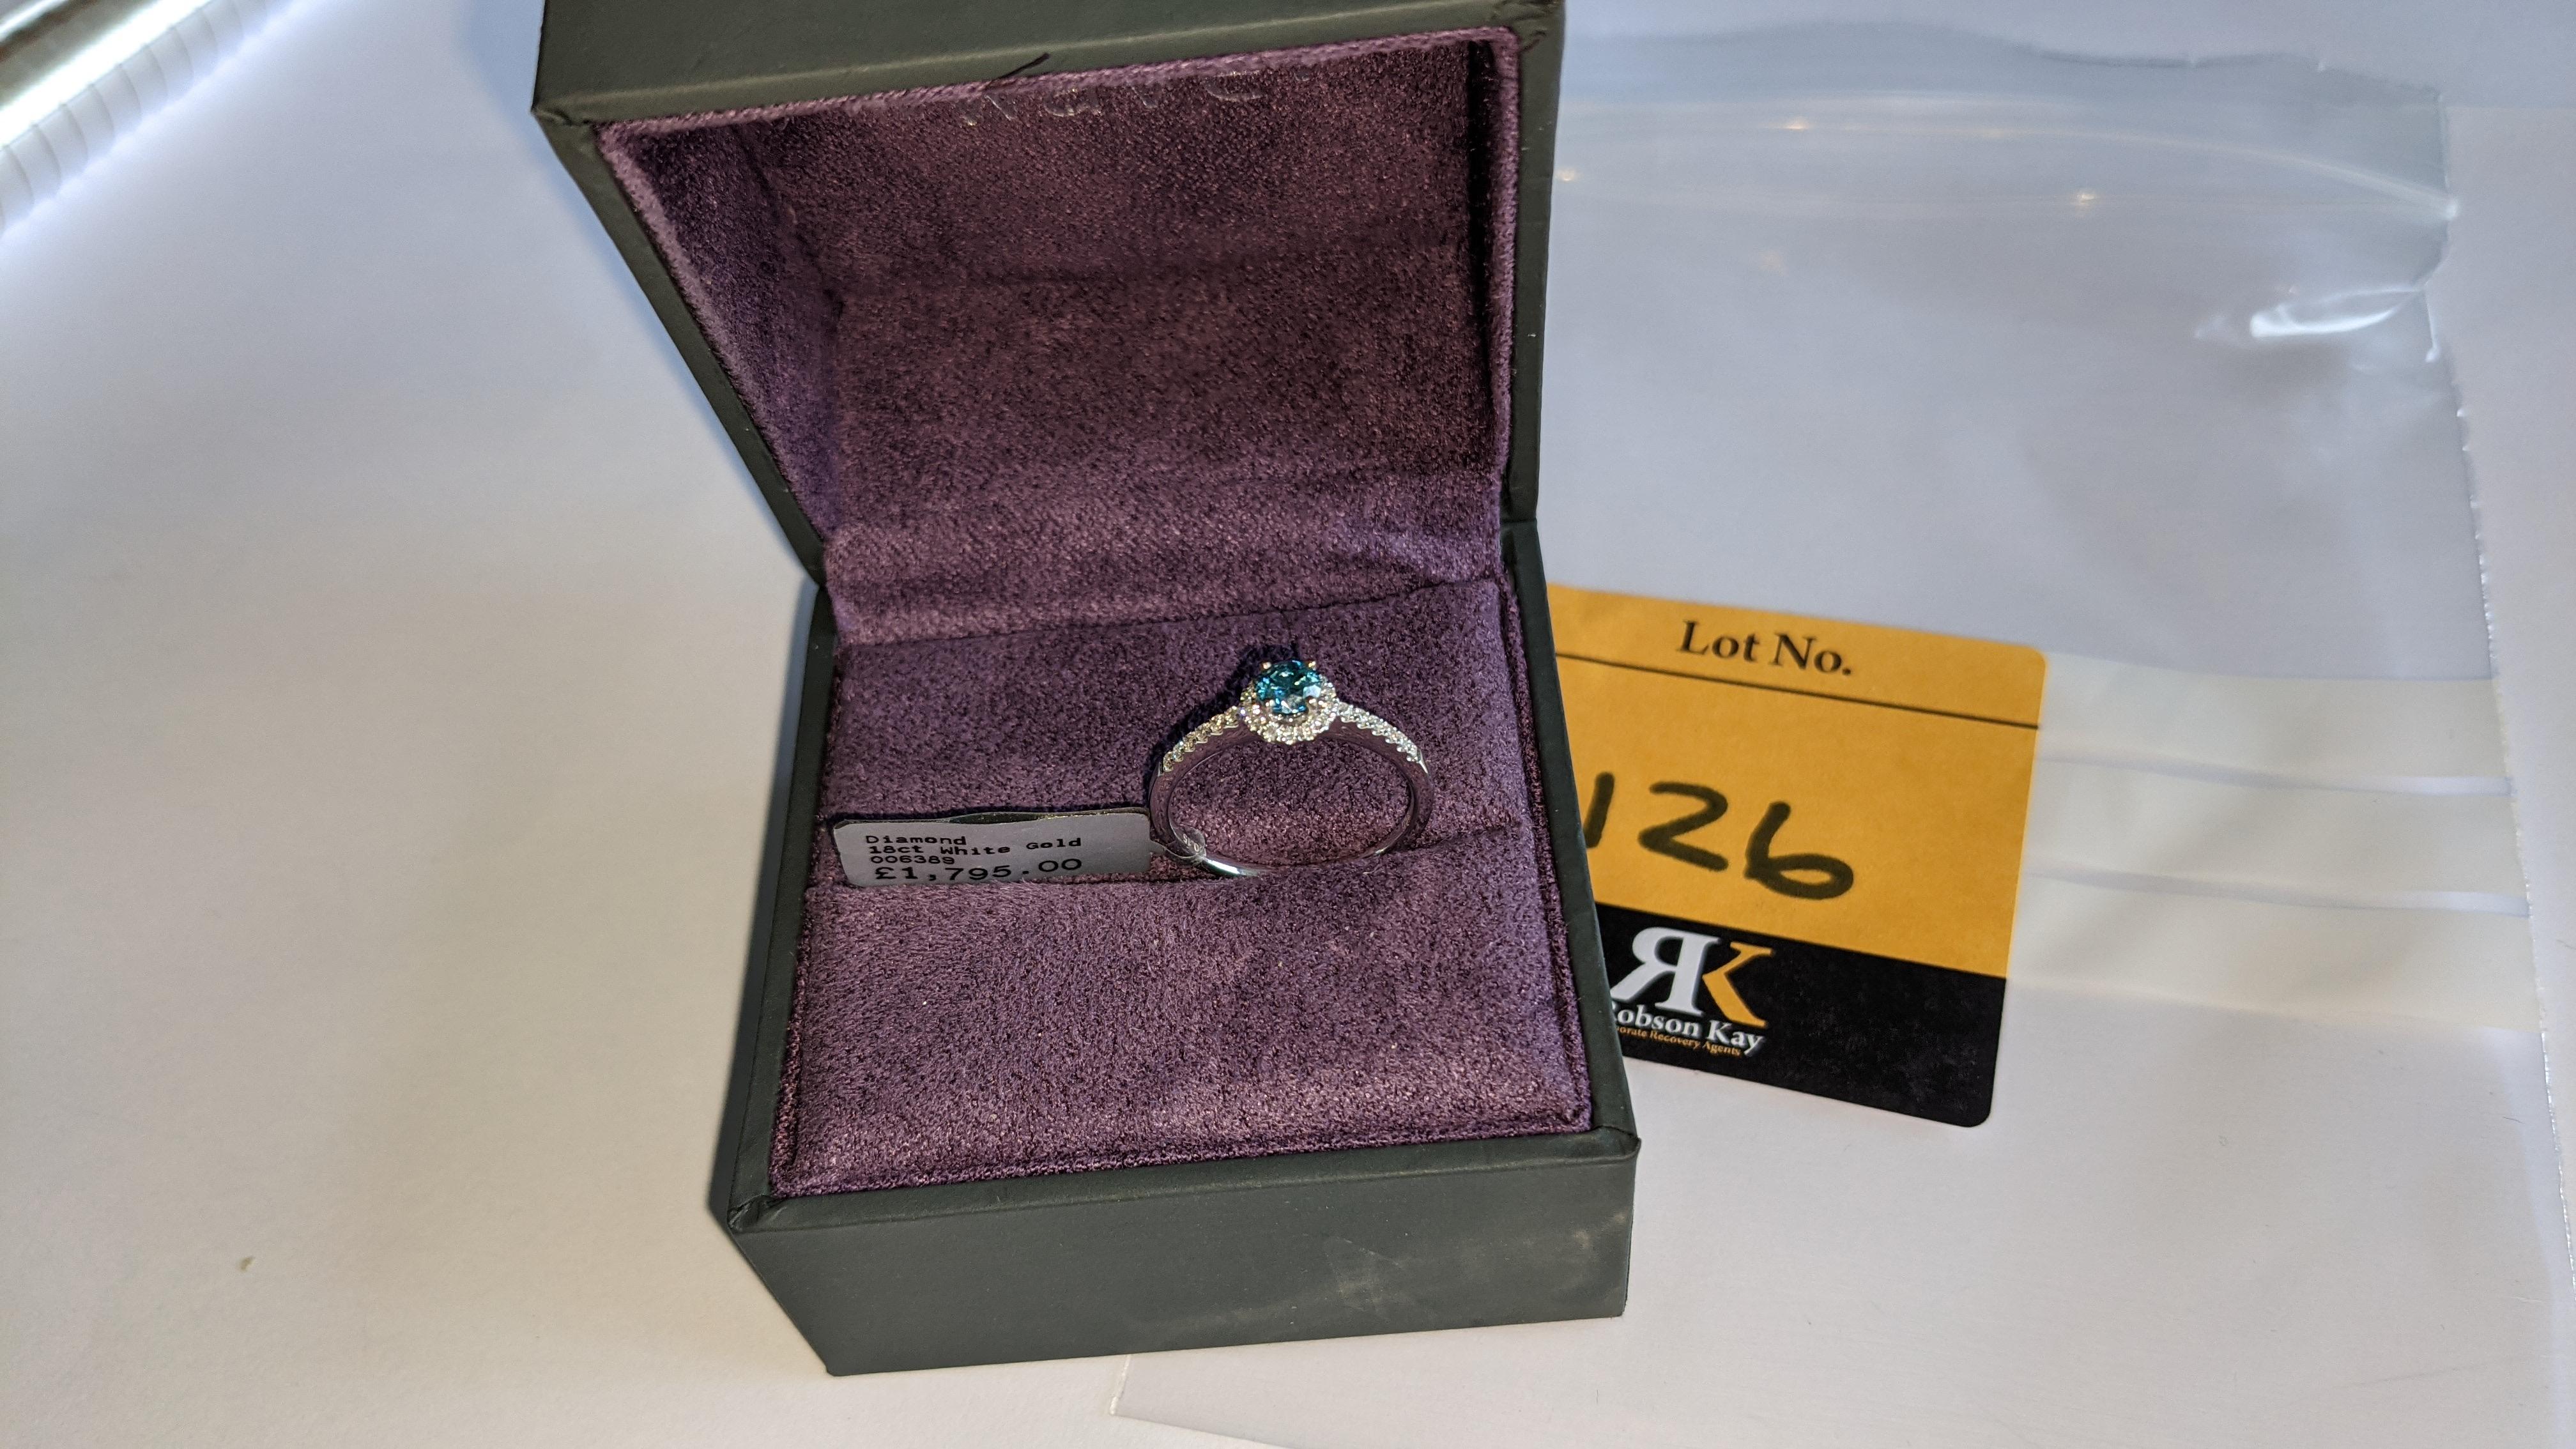 18ct white gold & diamond ring with 0.30ct blue diamond & 0.1ct of additional diamonds around the ce - Image 2 of 19